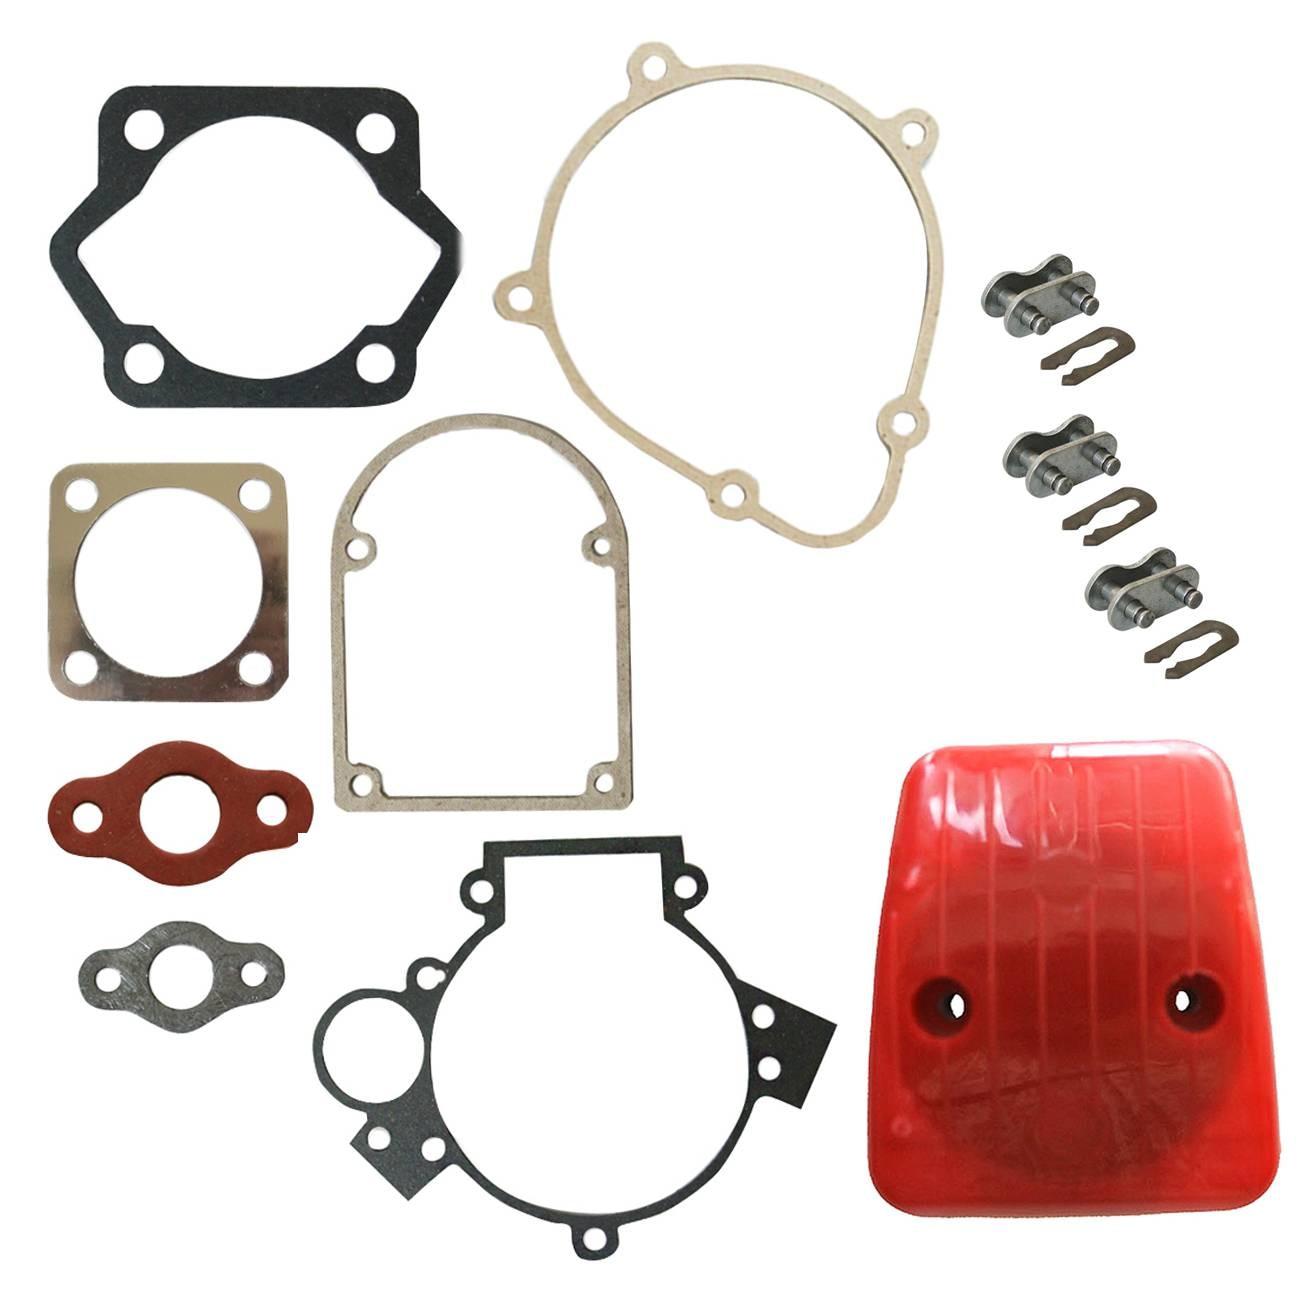 3x Chain <font><b>Master</b></font> Link&Red Carburetor <font><b>Air</b></font> <font><b>Filter</b></font>&Gasket Kit Fit 49cc Motorized Bike